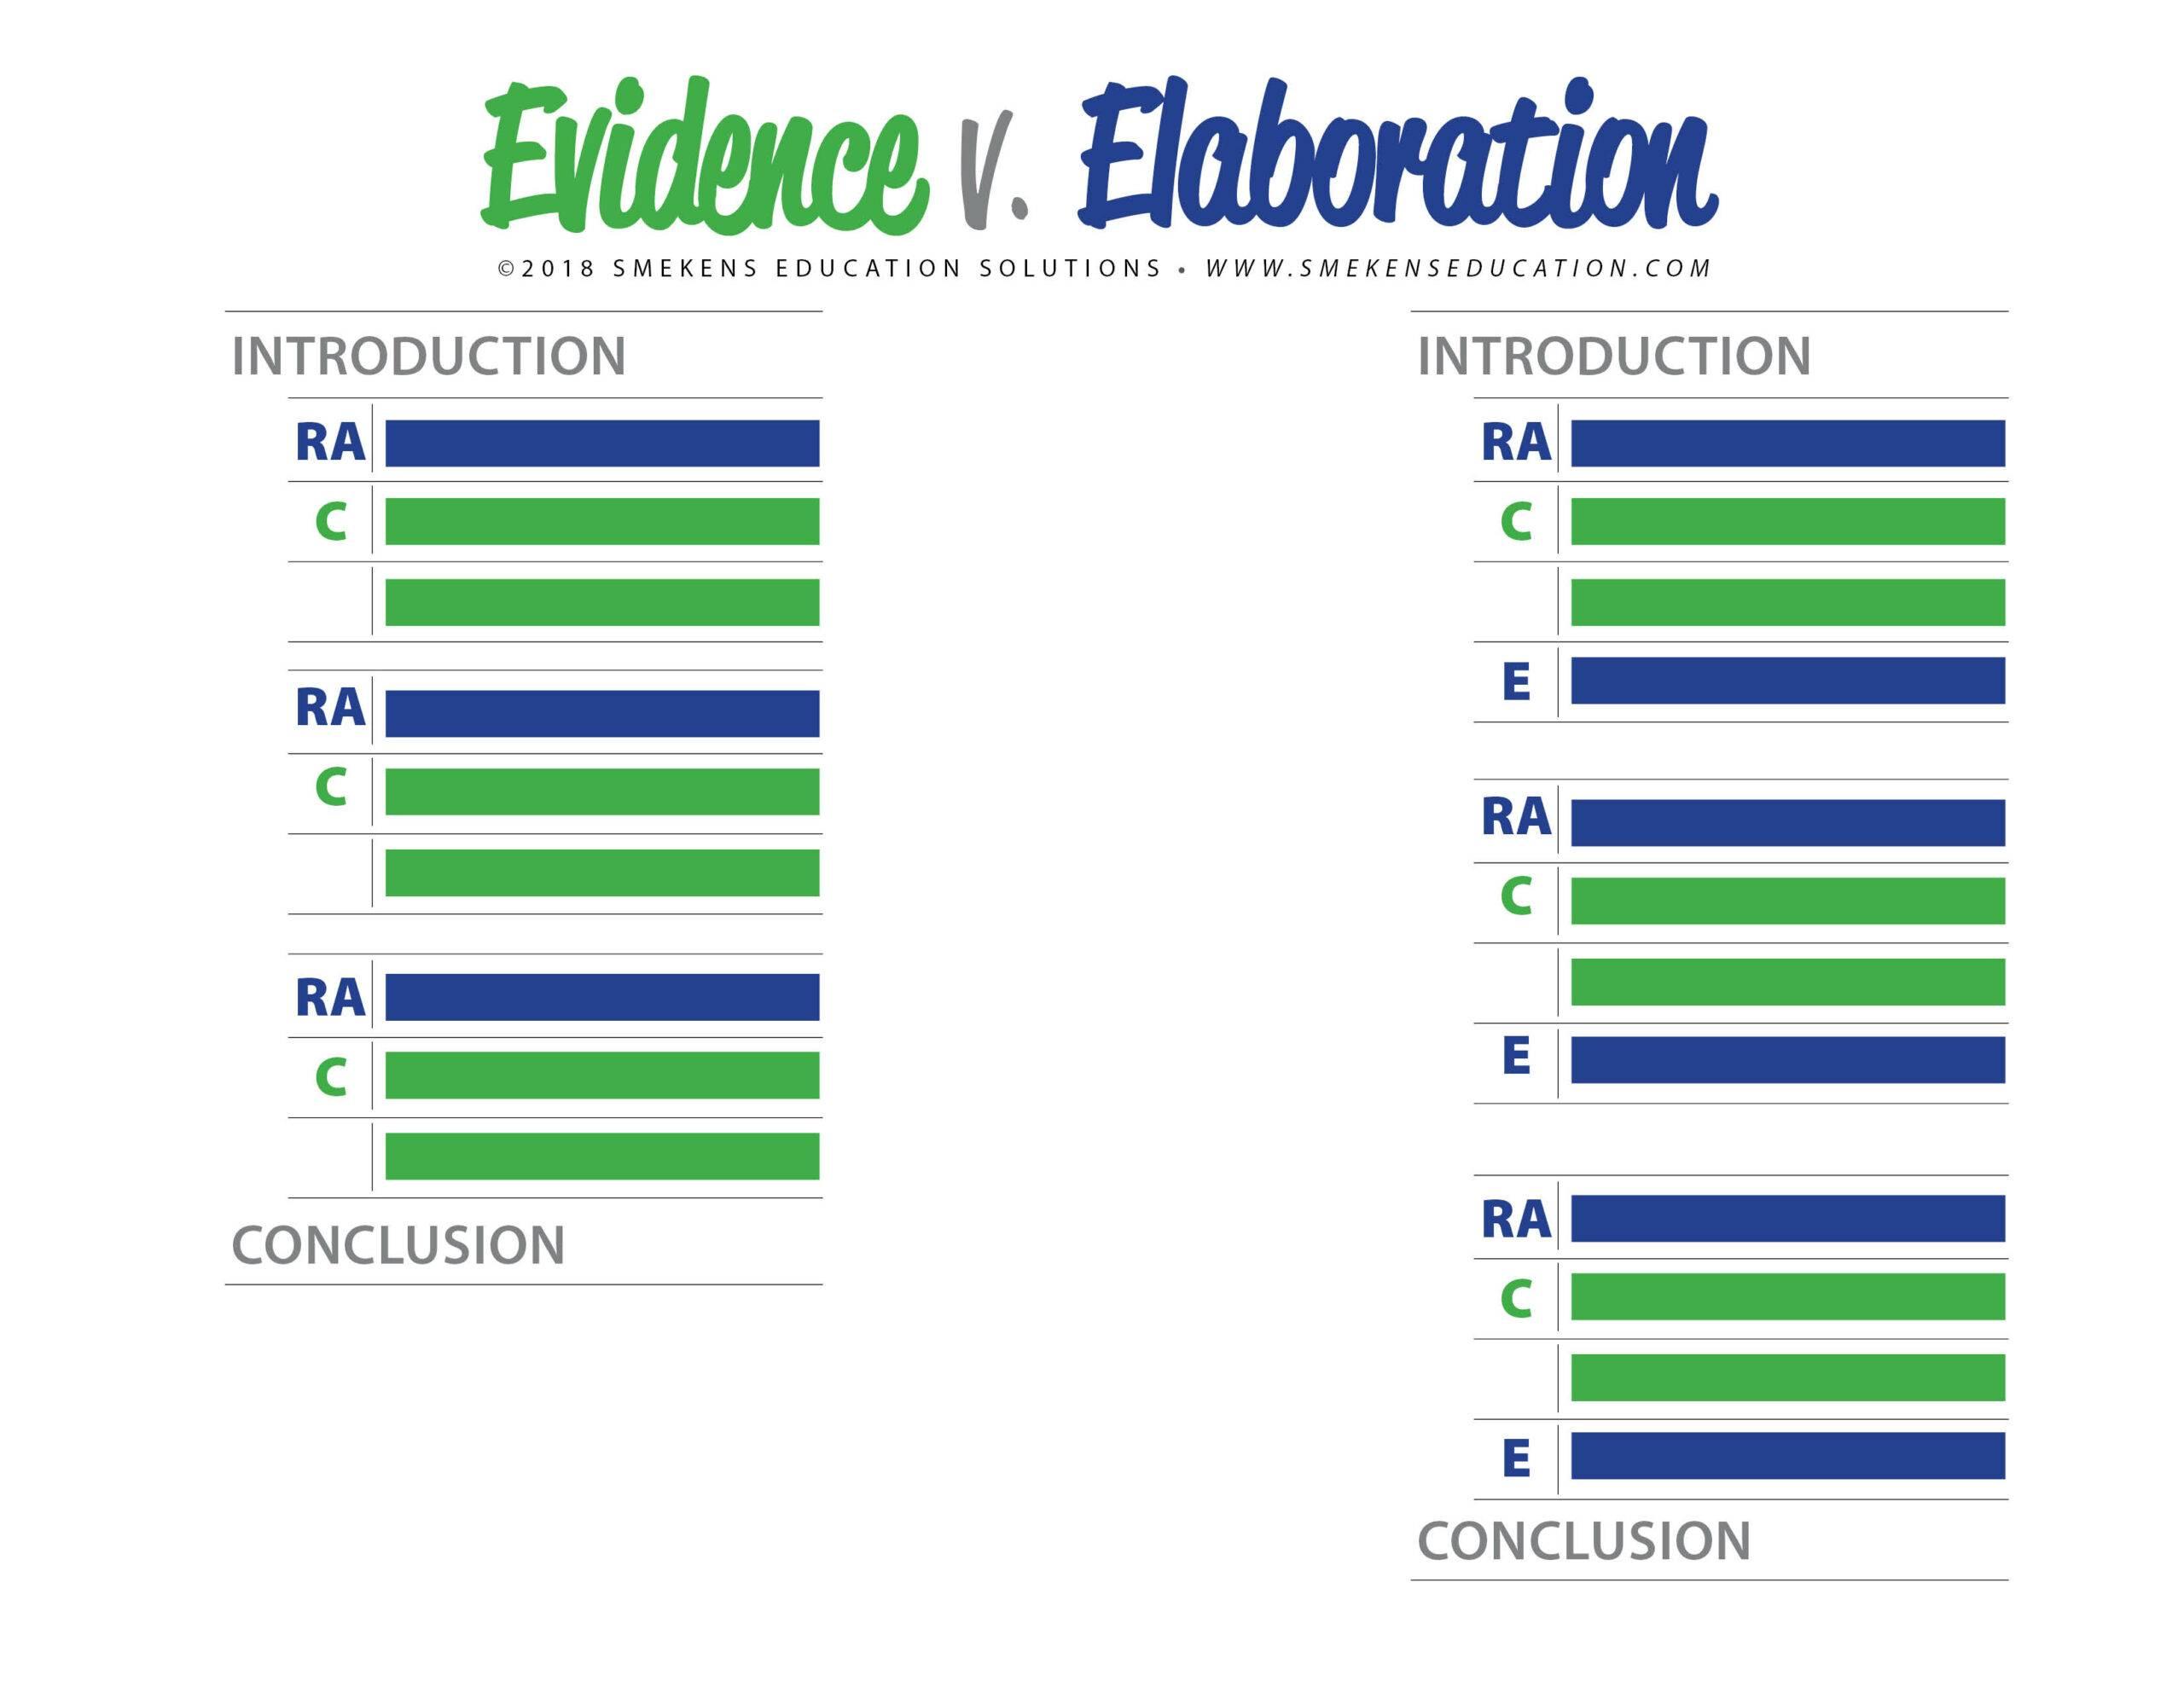 Evidence v. Elaboration - RACE